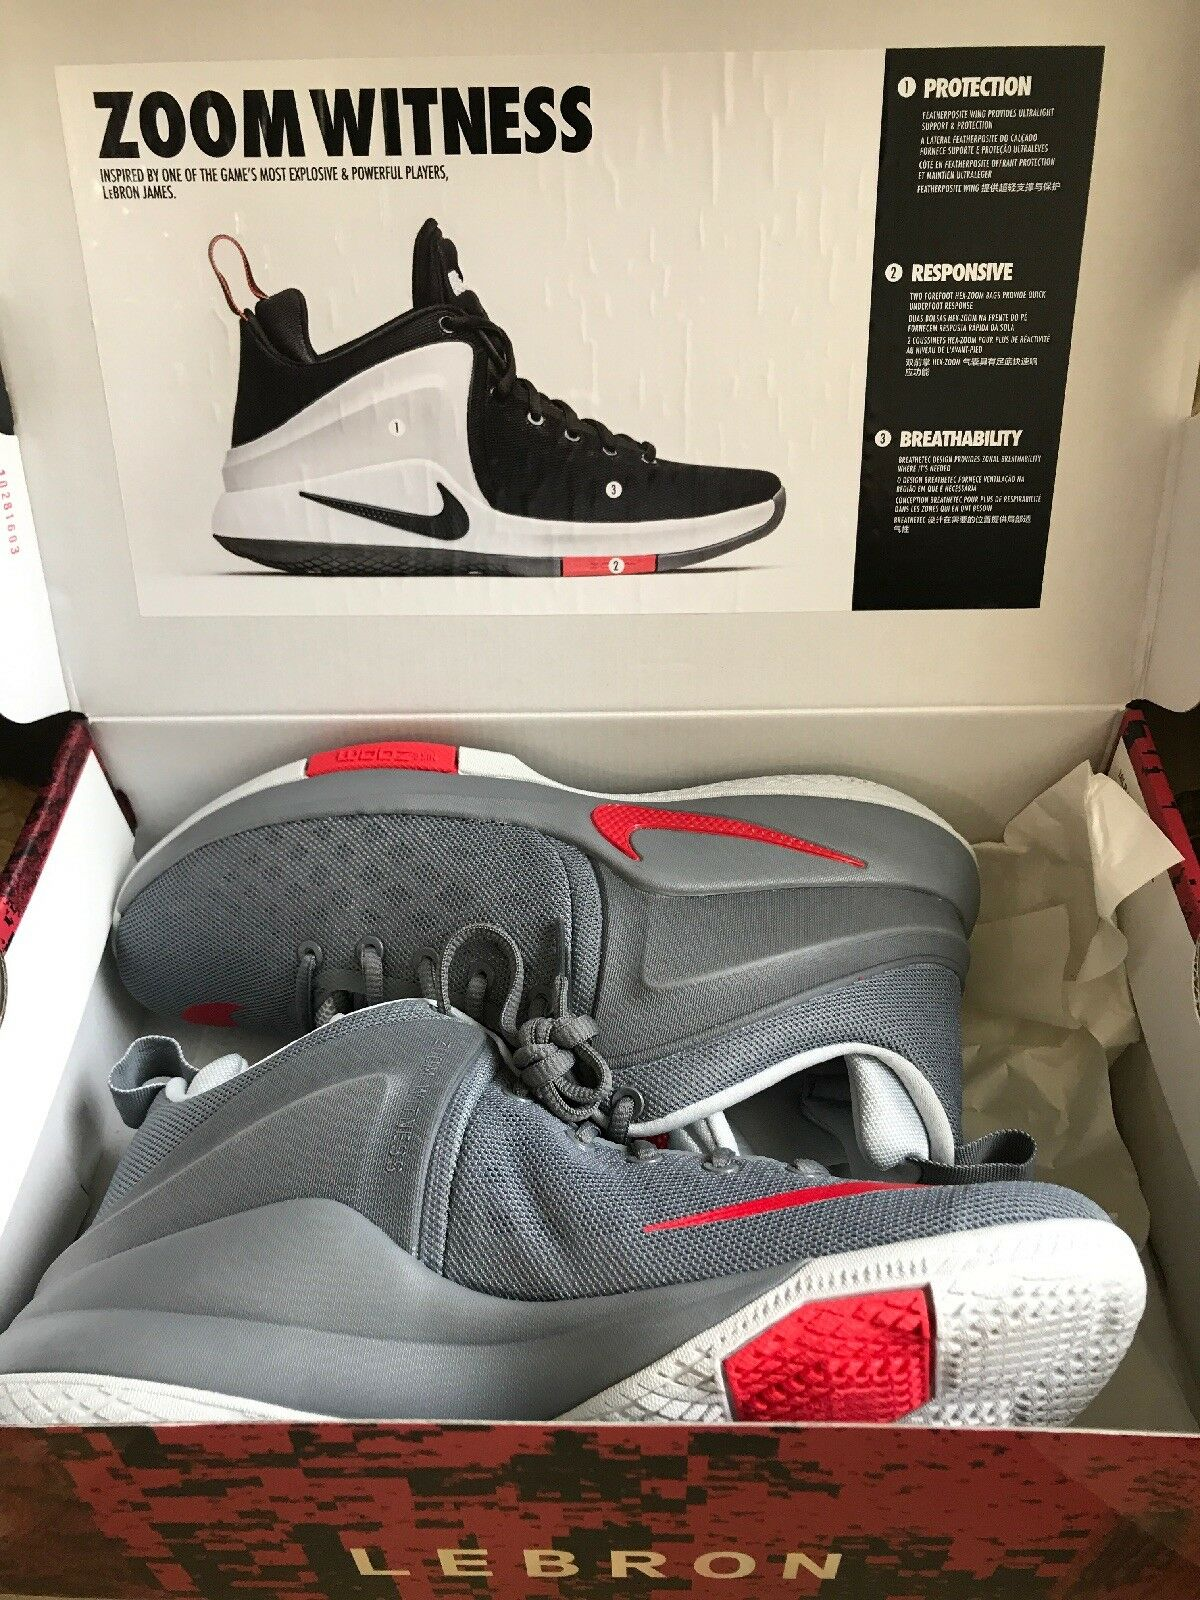 Nike Zoom Zoom Zoom Witness LeBron James Cool Grey Mens Basketball shoes 852439 005 Sz 8 413f0a